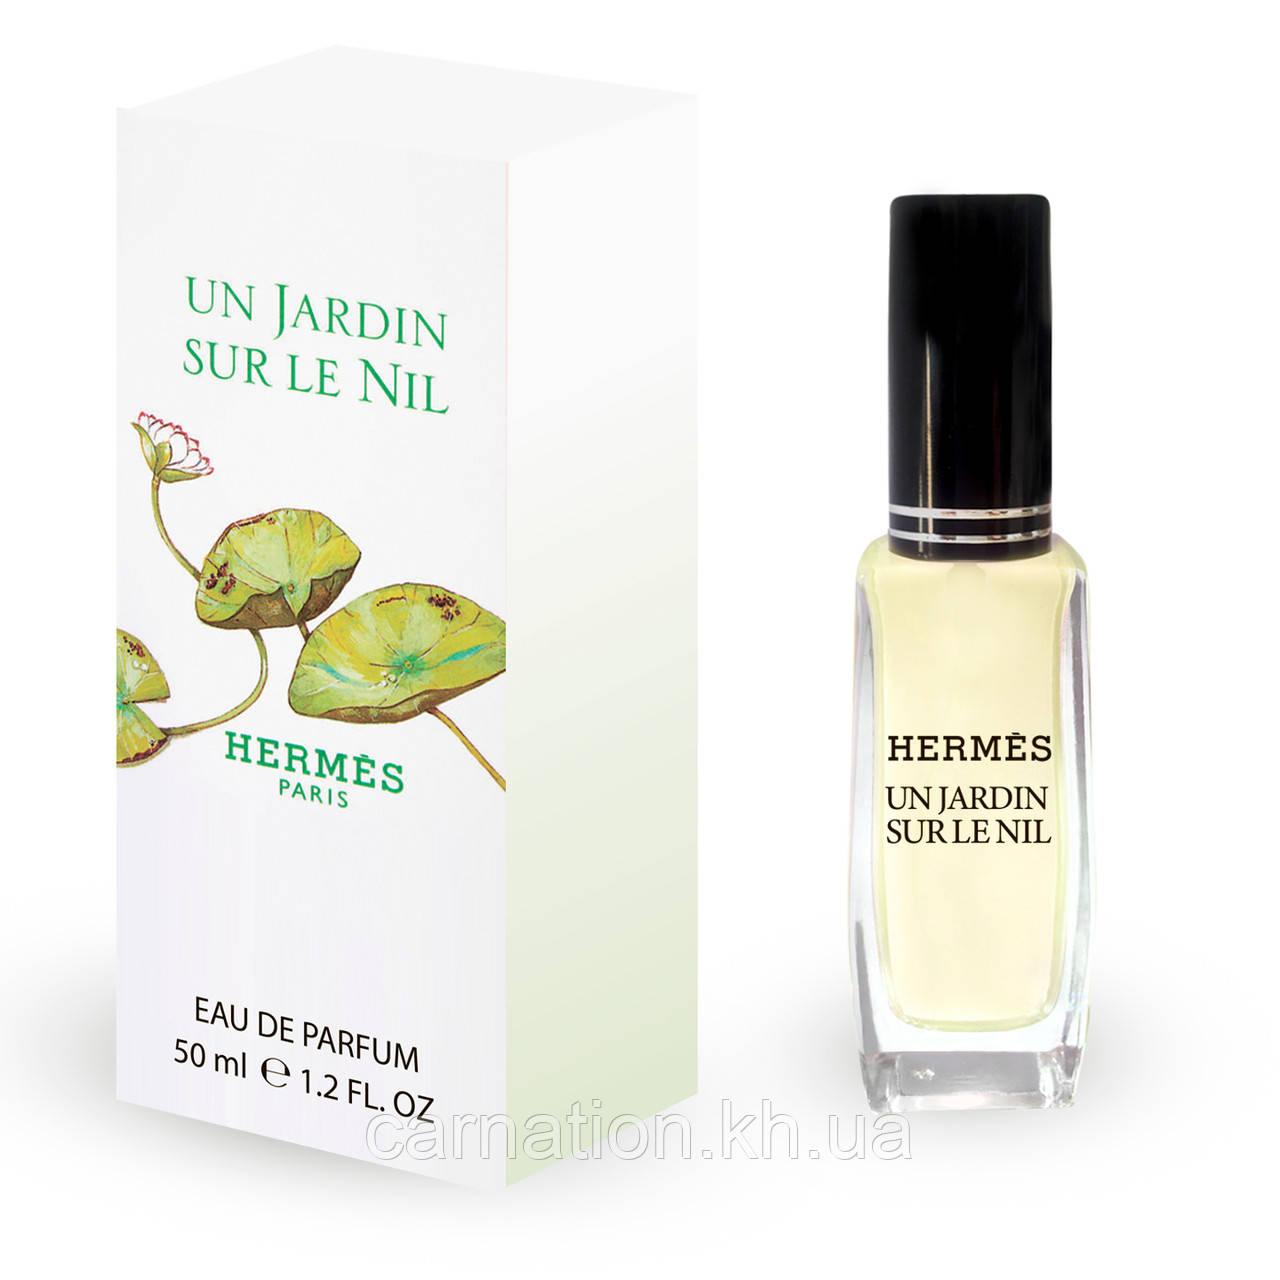 Женский мини парфюм  Hermes Un Jardin sur le Nil  50 мл